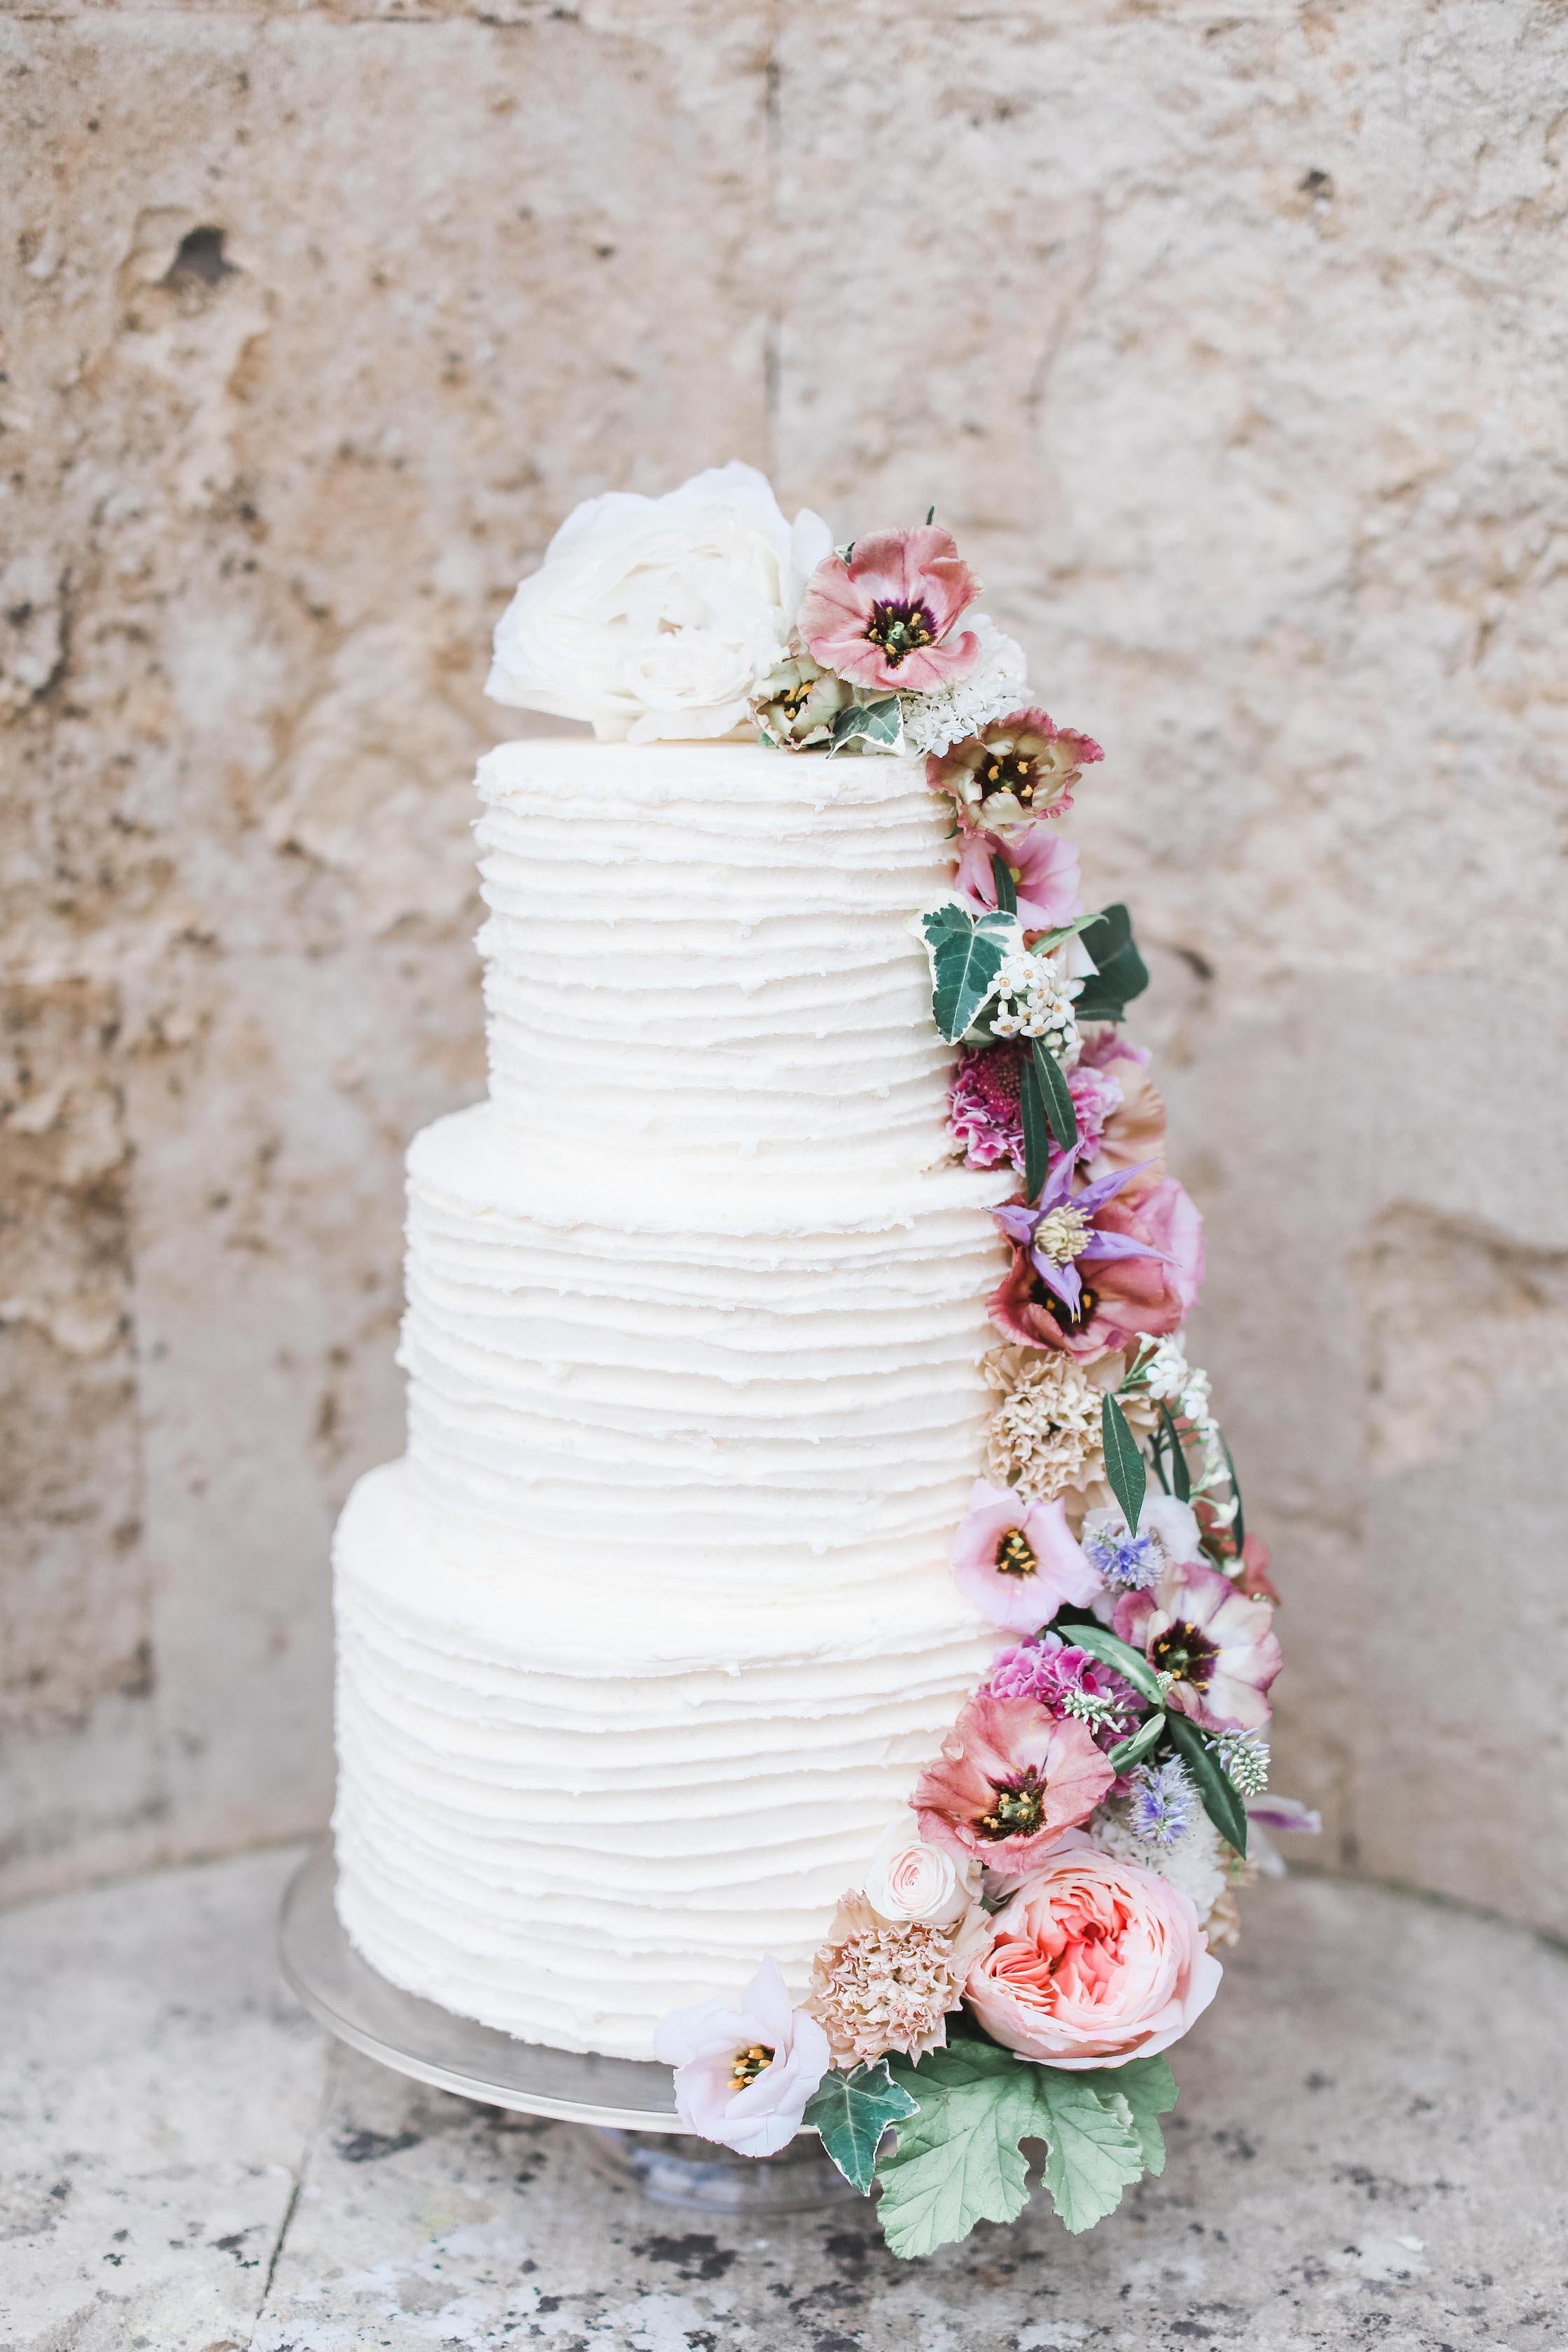 Cake Flowers - Cake Design - Modern Cake Flowers